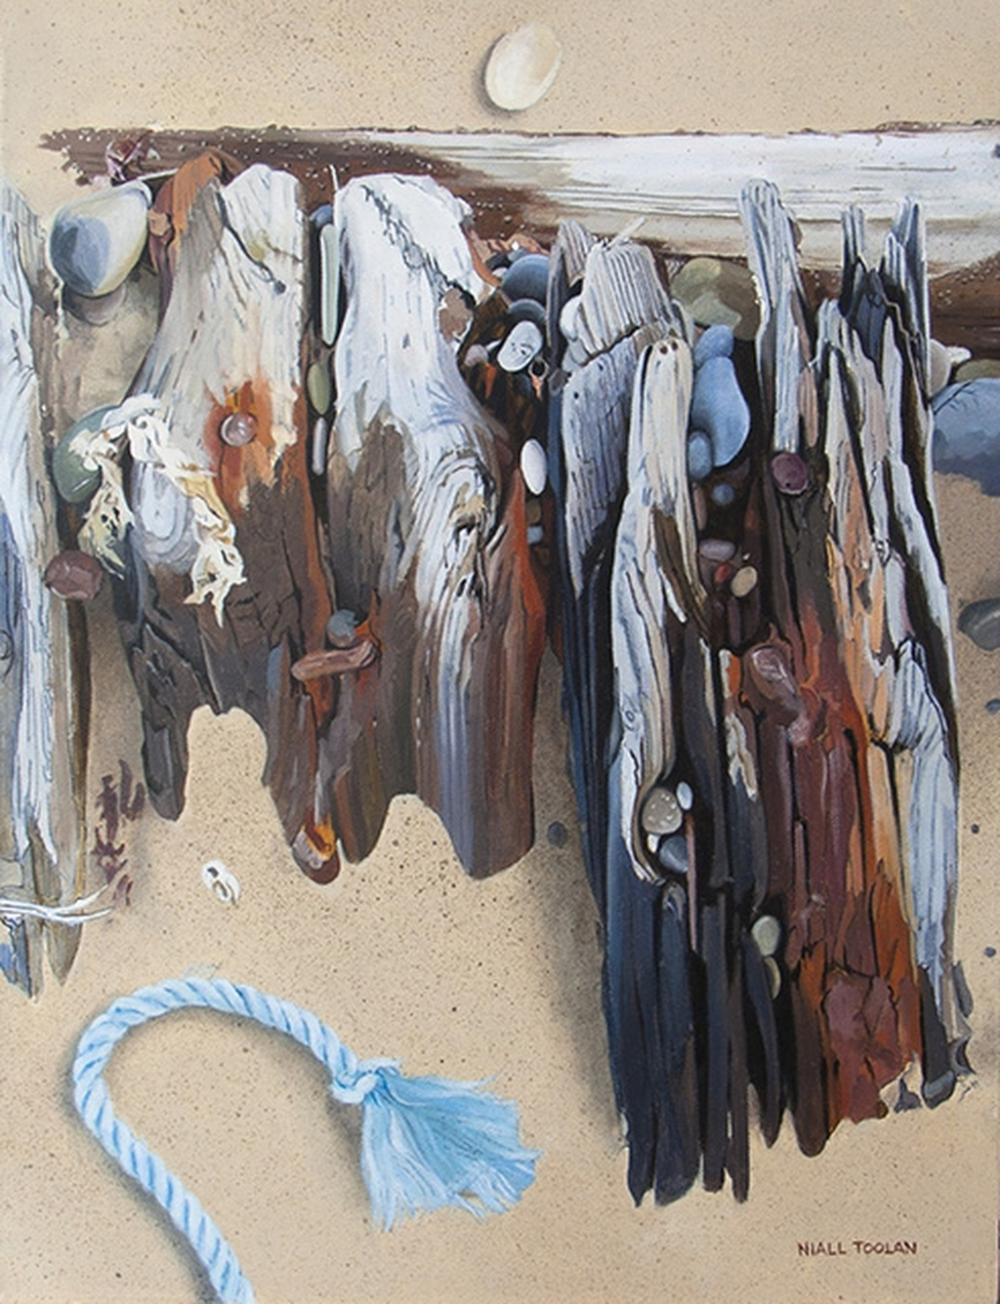 Niall Toolin - Beach Life II